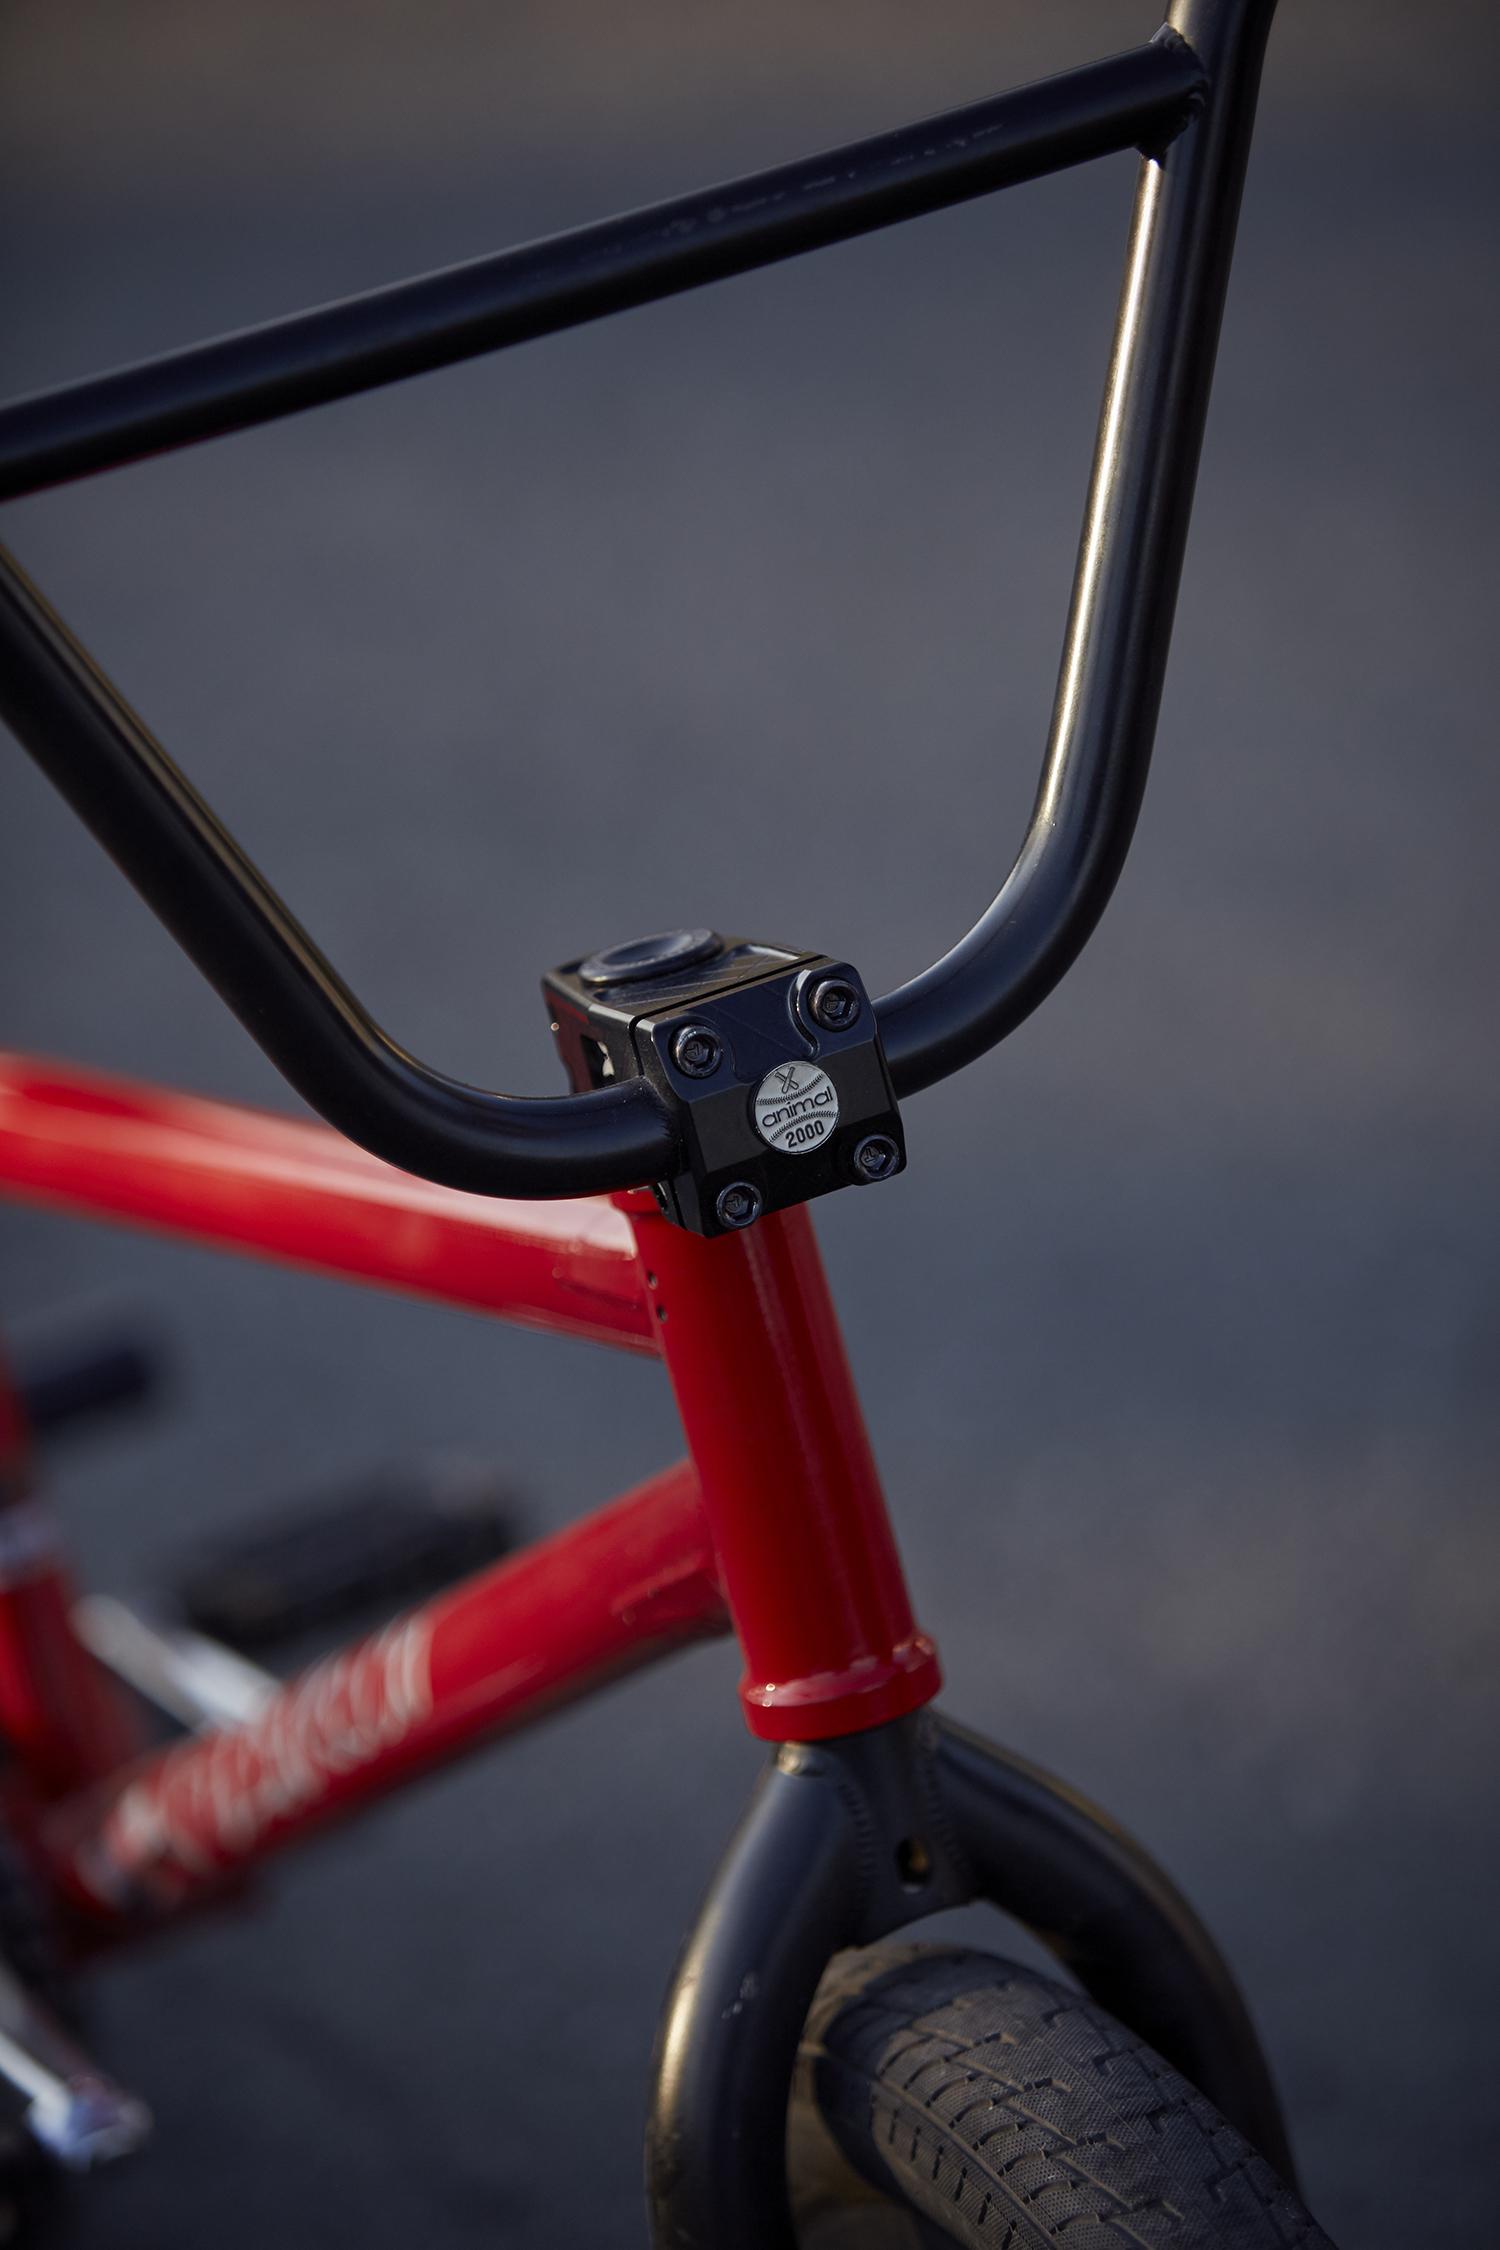 Adrien bike check 9websize.jpg